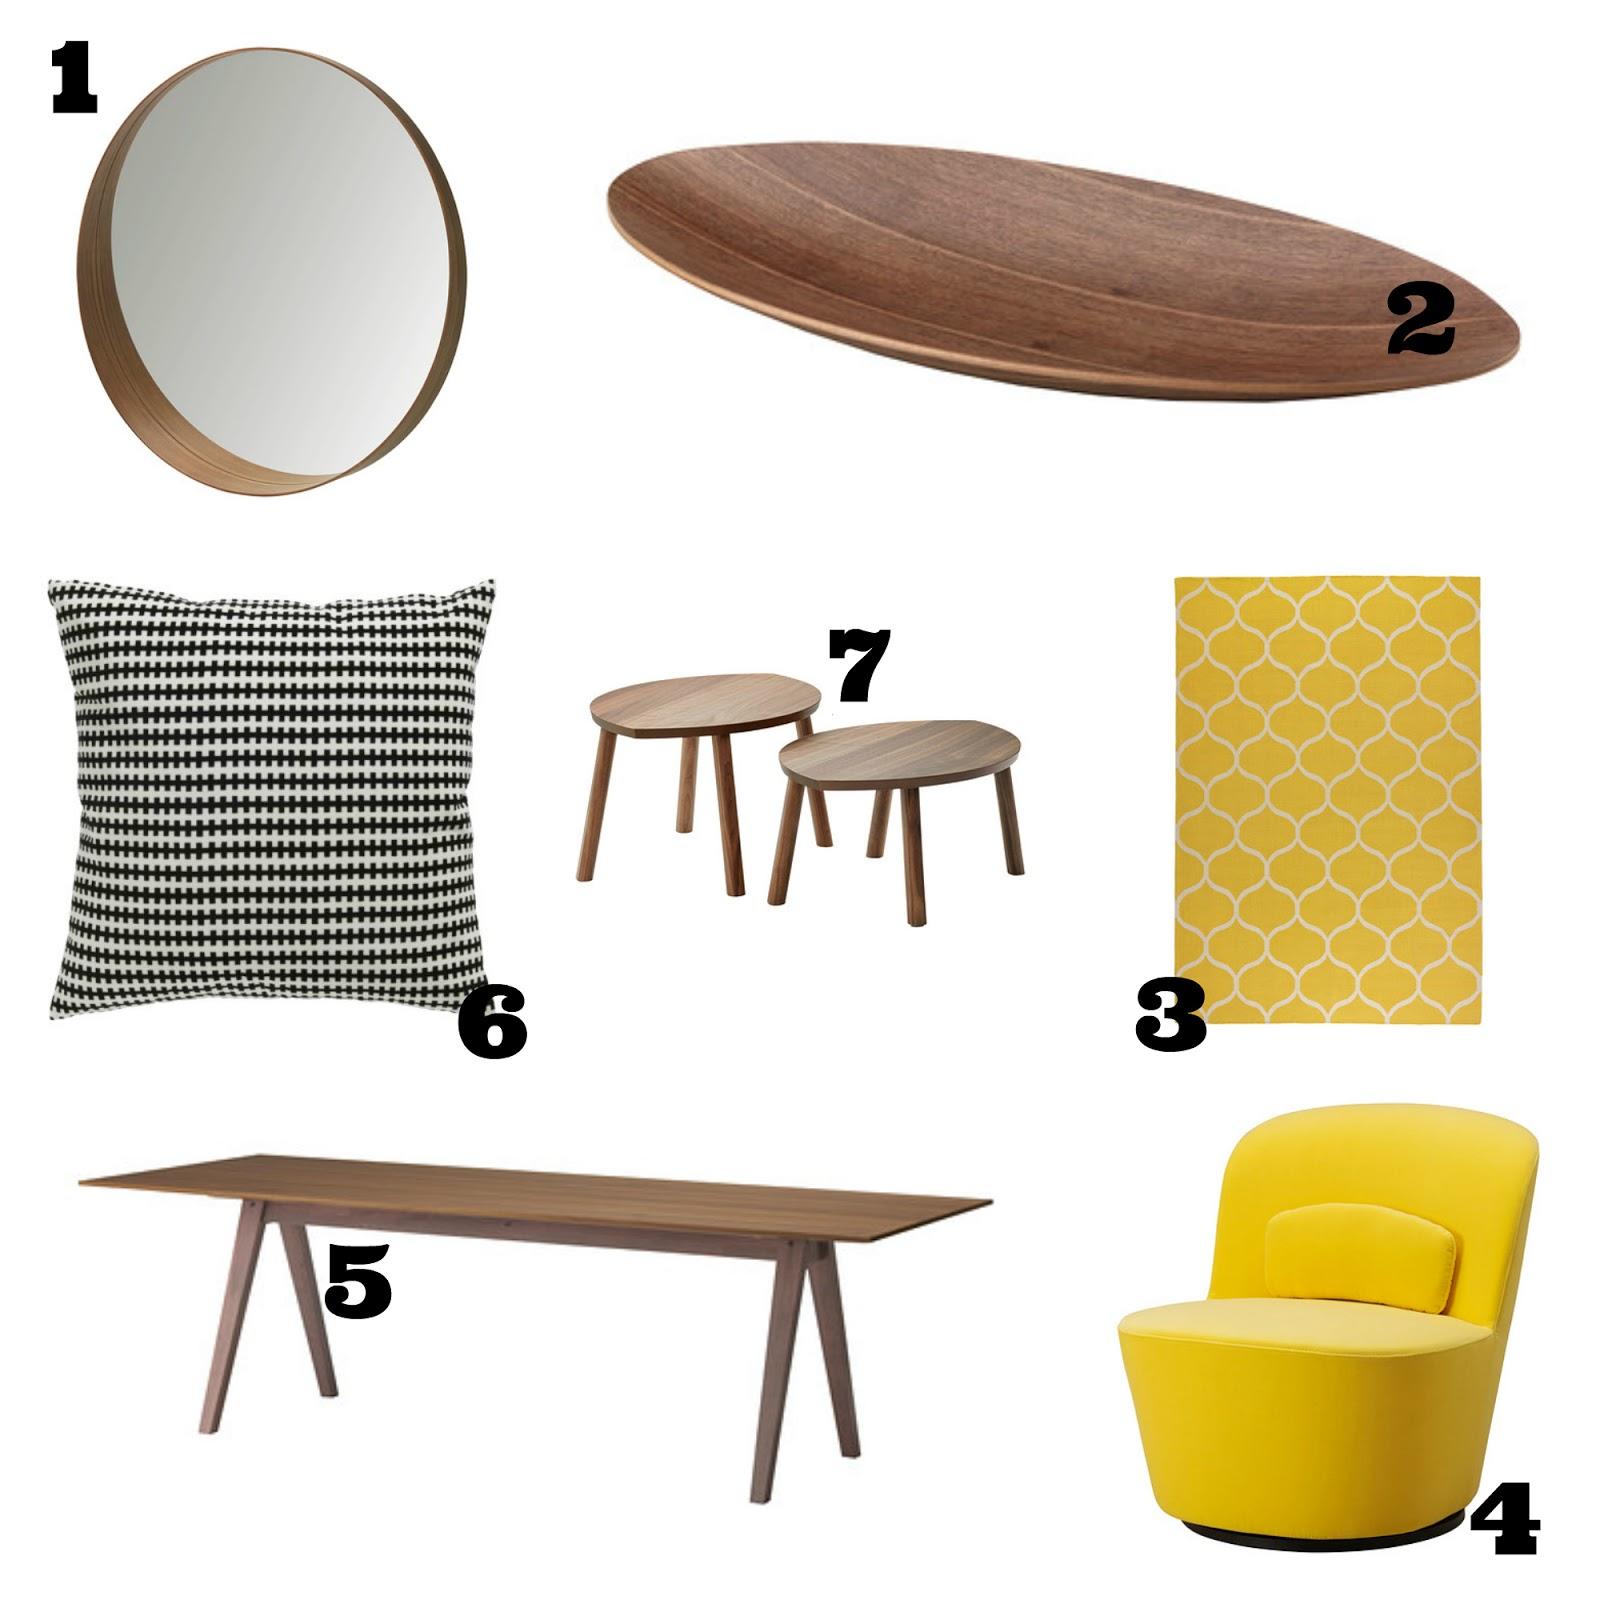 Image gallery ikea stockholm range for Ikea range four